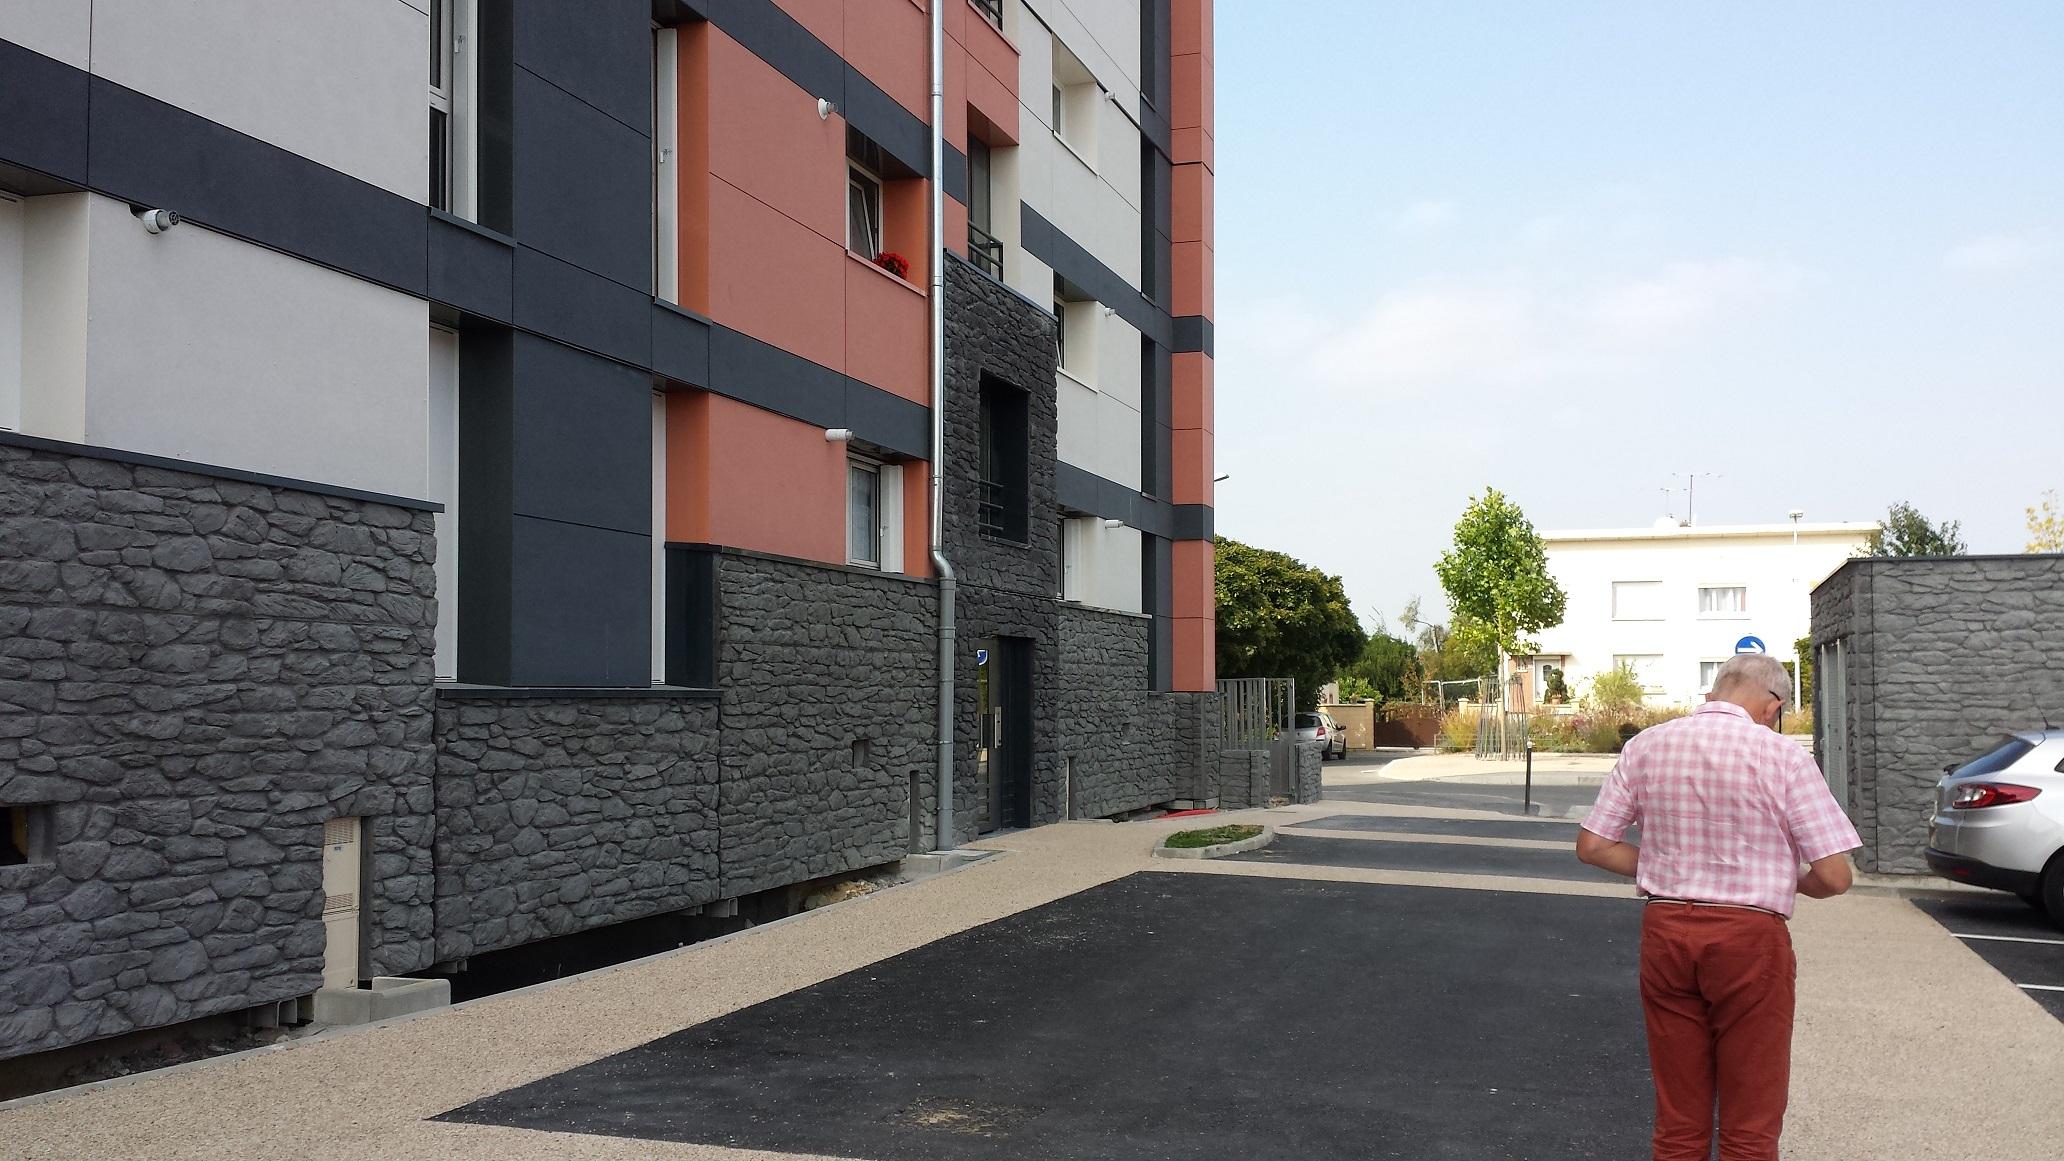 R f rences fixinox r novations thermiques fixinox - Architecte amiens renovation ...